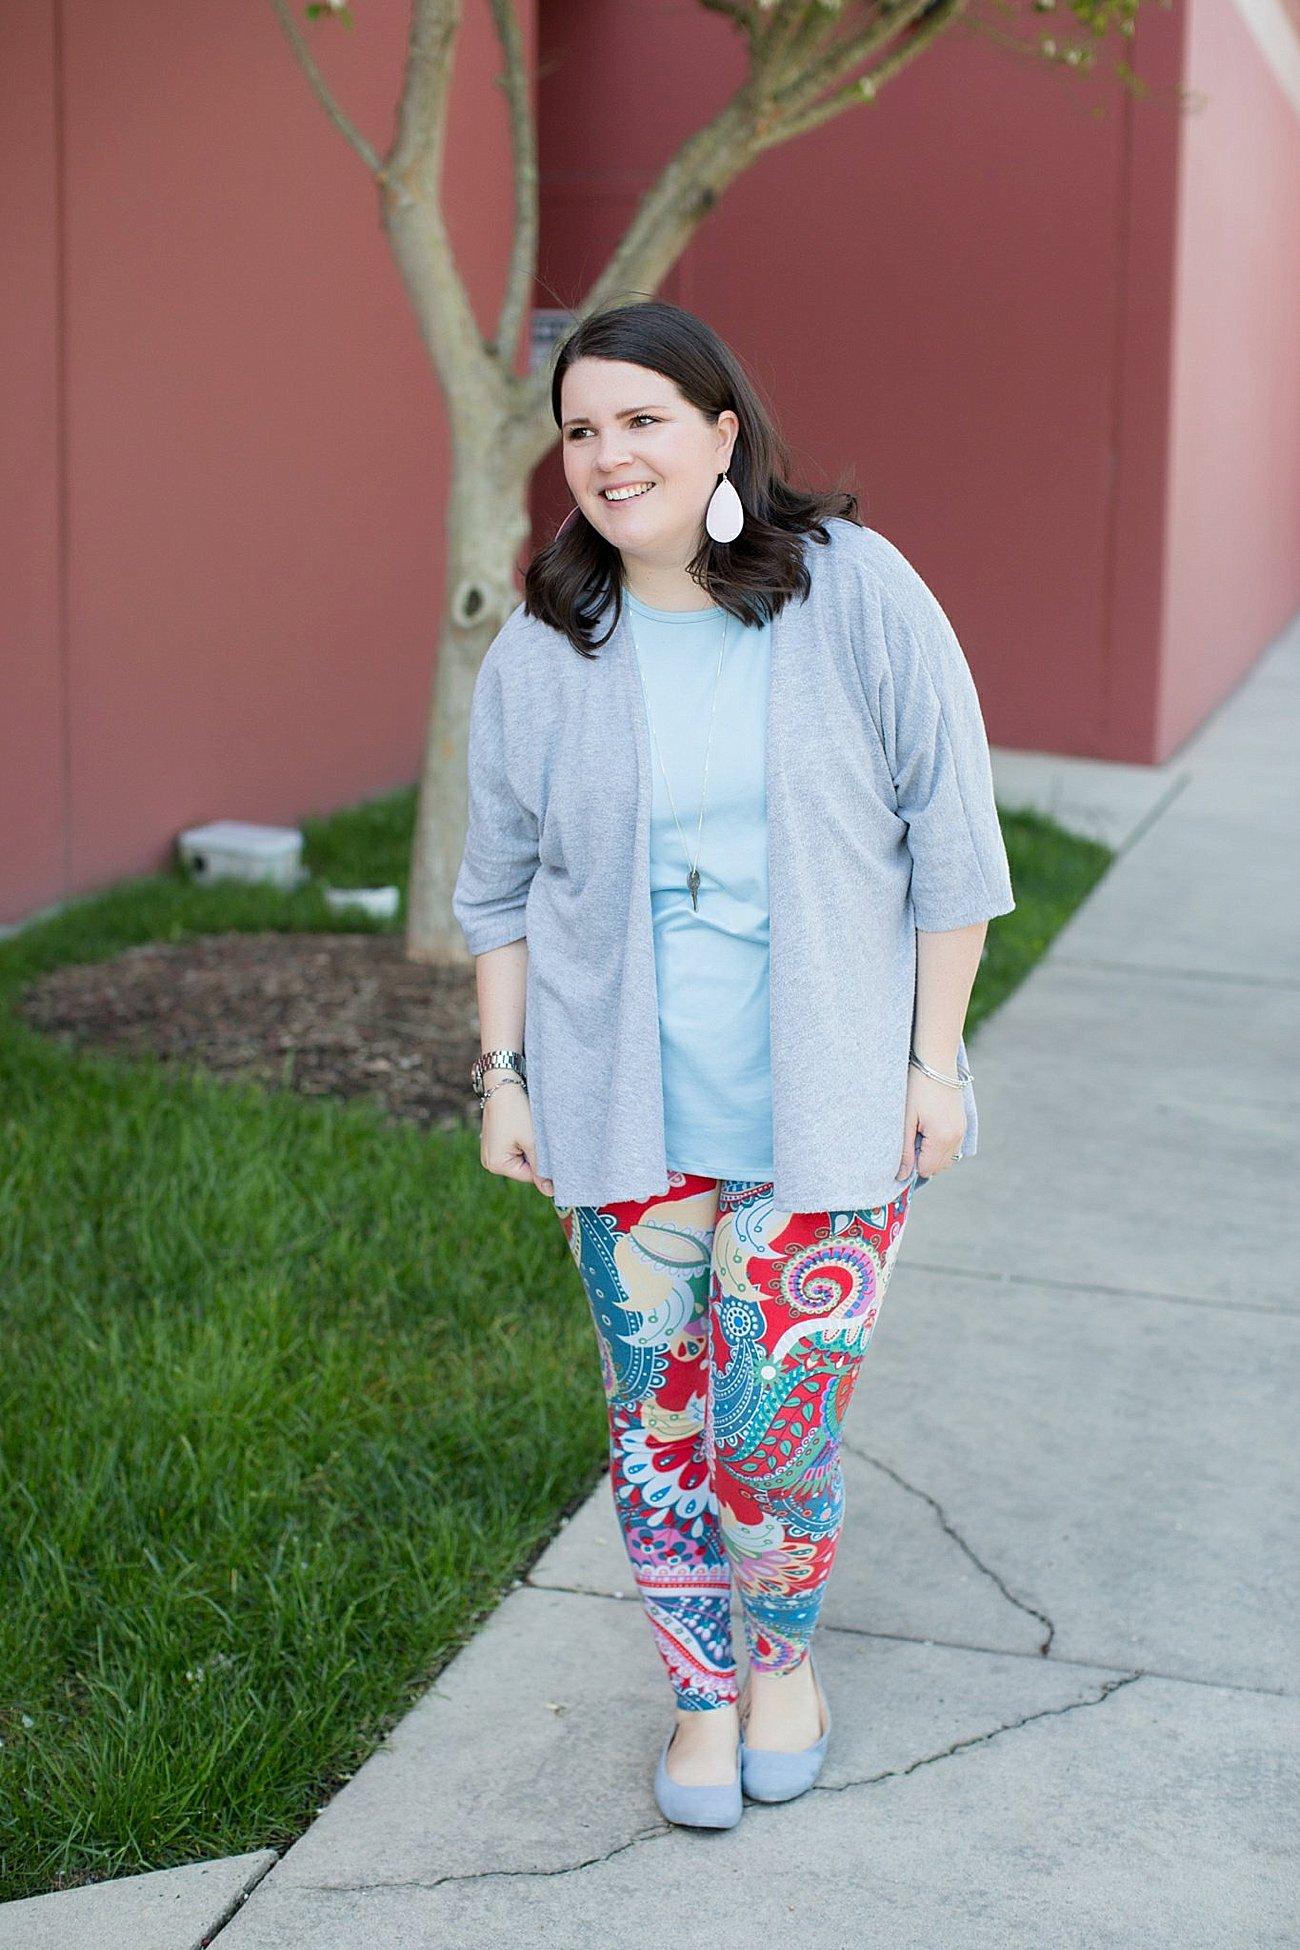 LulaRoe Lindsay Kimono in Grey, Lularoe Irma tunic, Paisley printed LulaRoe leggings, The Root Collective Gaby Ballet Flat, Nickel and Suede Earrings | Mom Style | North Carolina Fashion & Style Blogger (4)